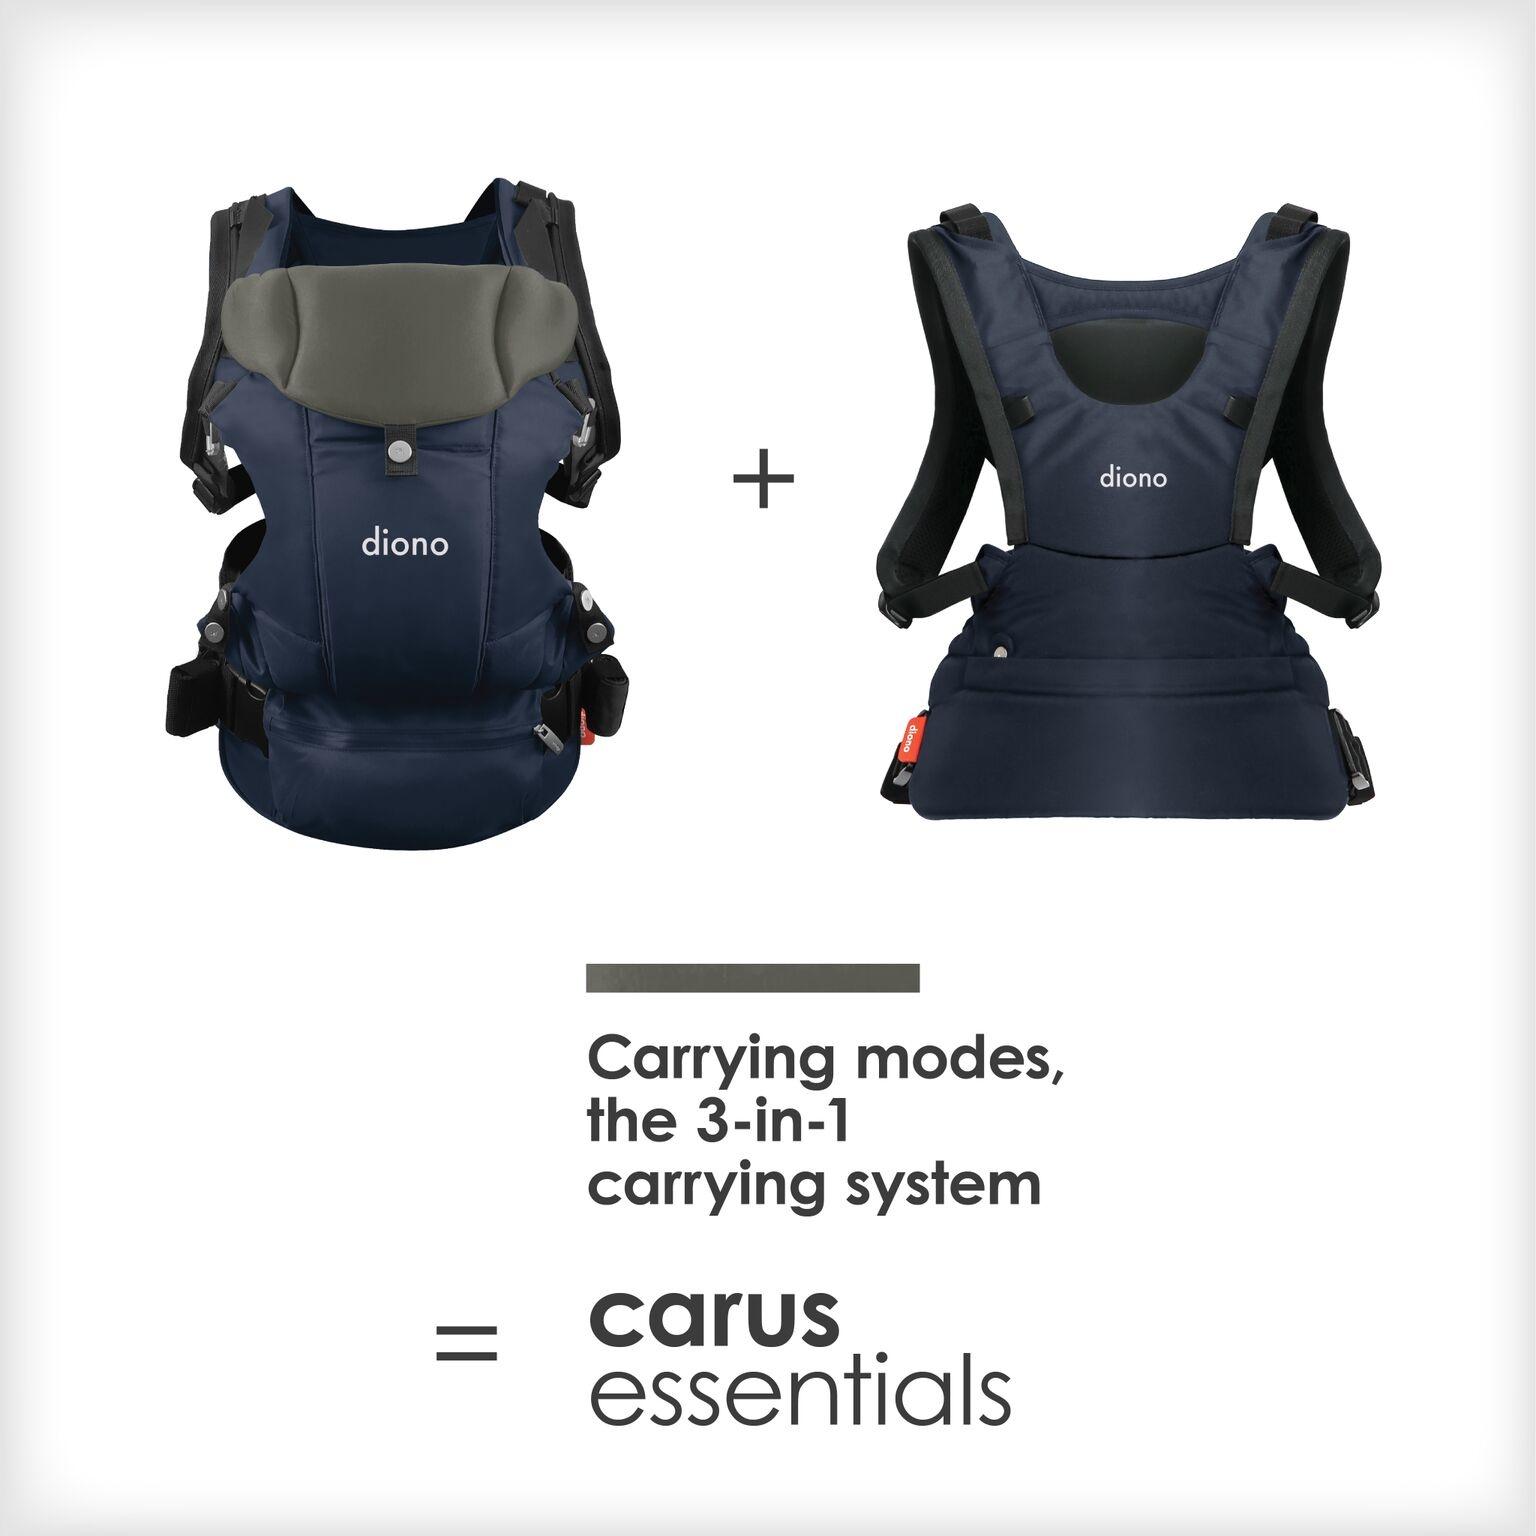 Diono Carus Essentials 3-in-1 Carrier